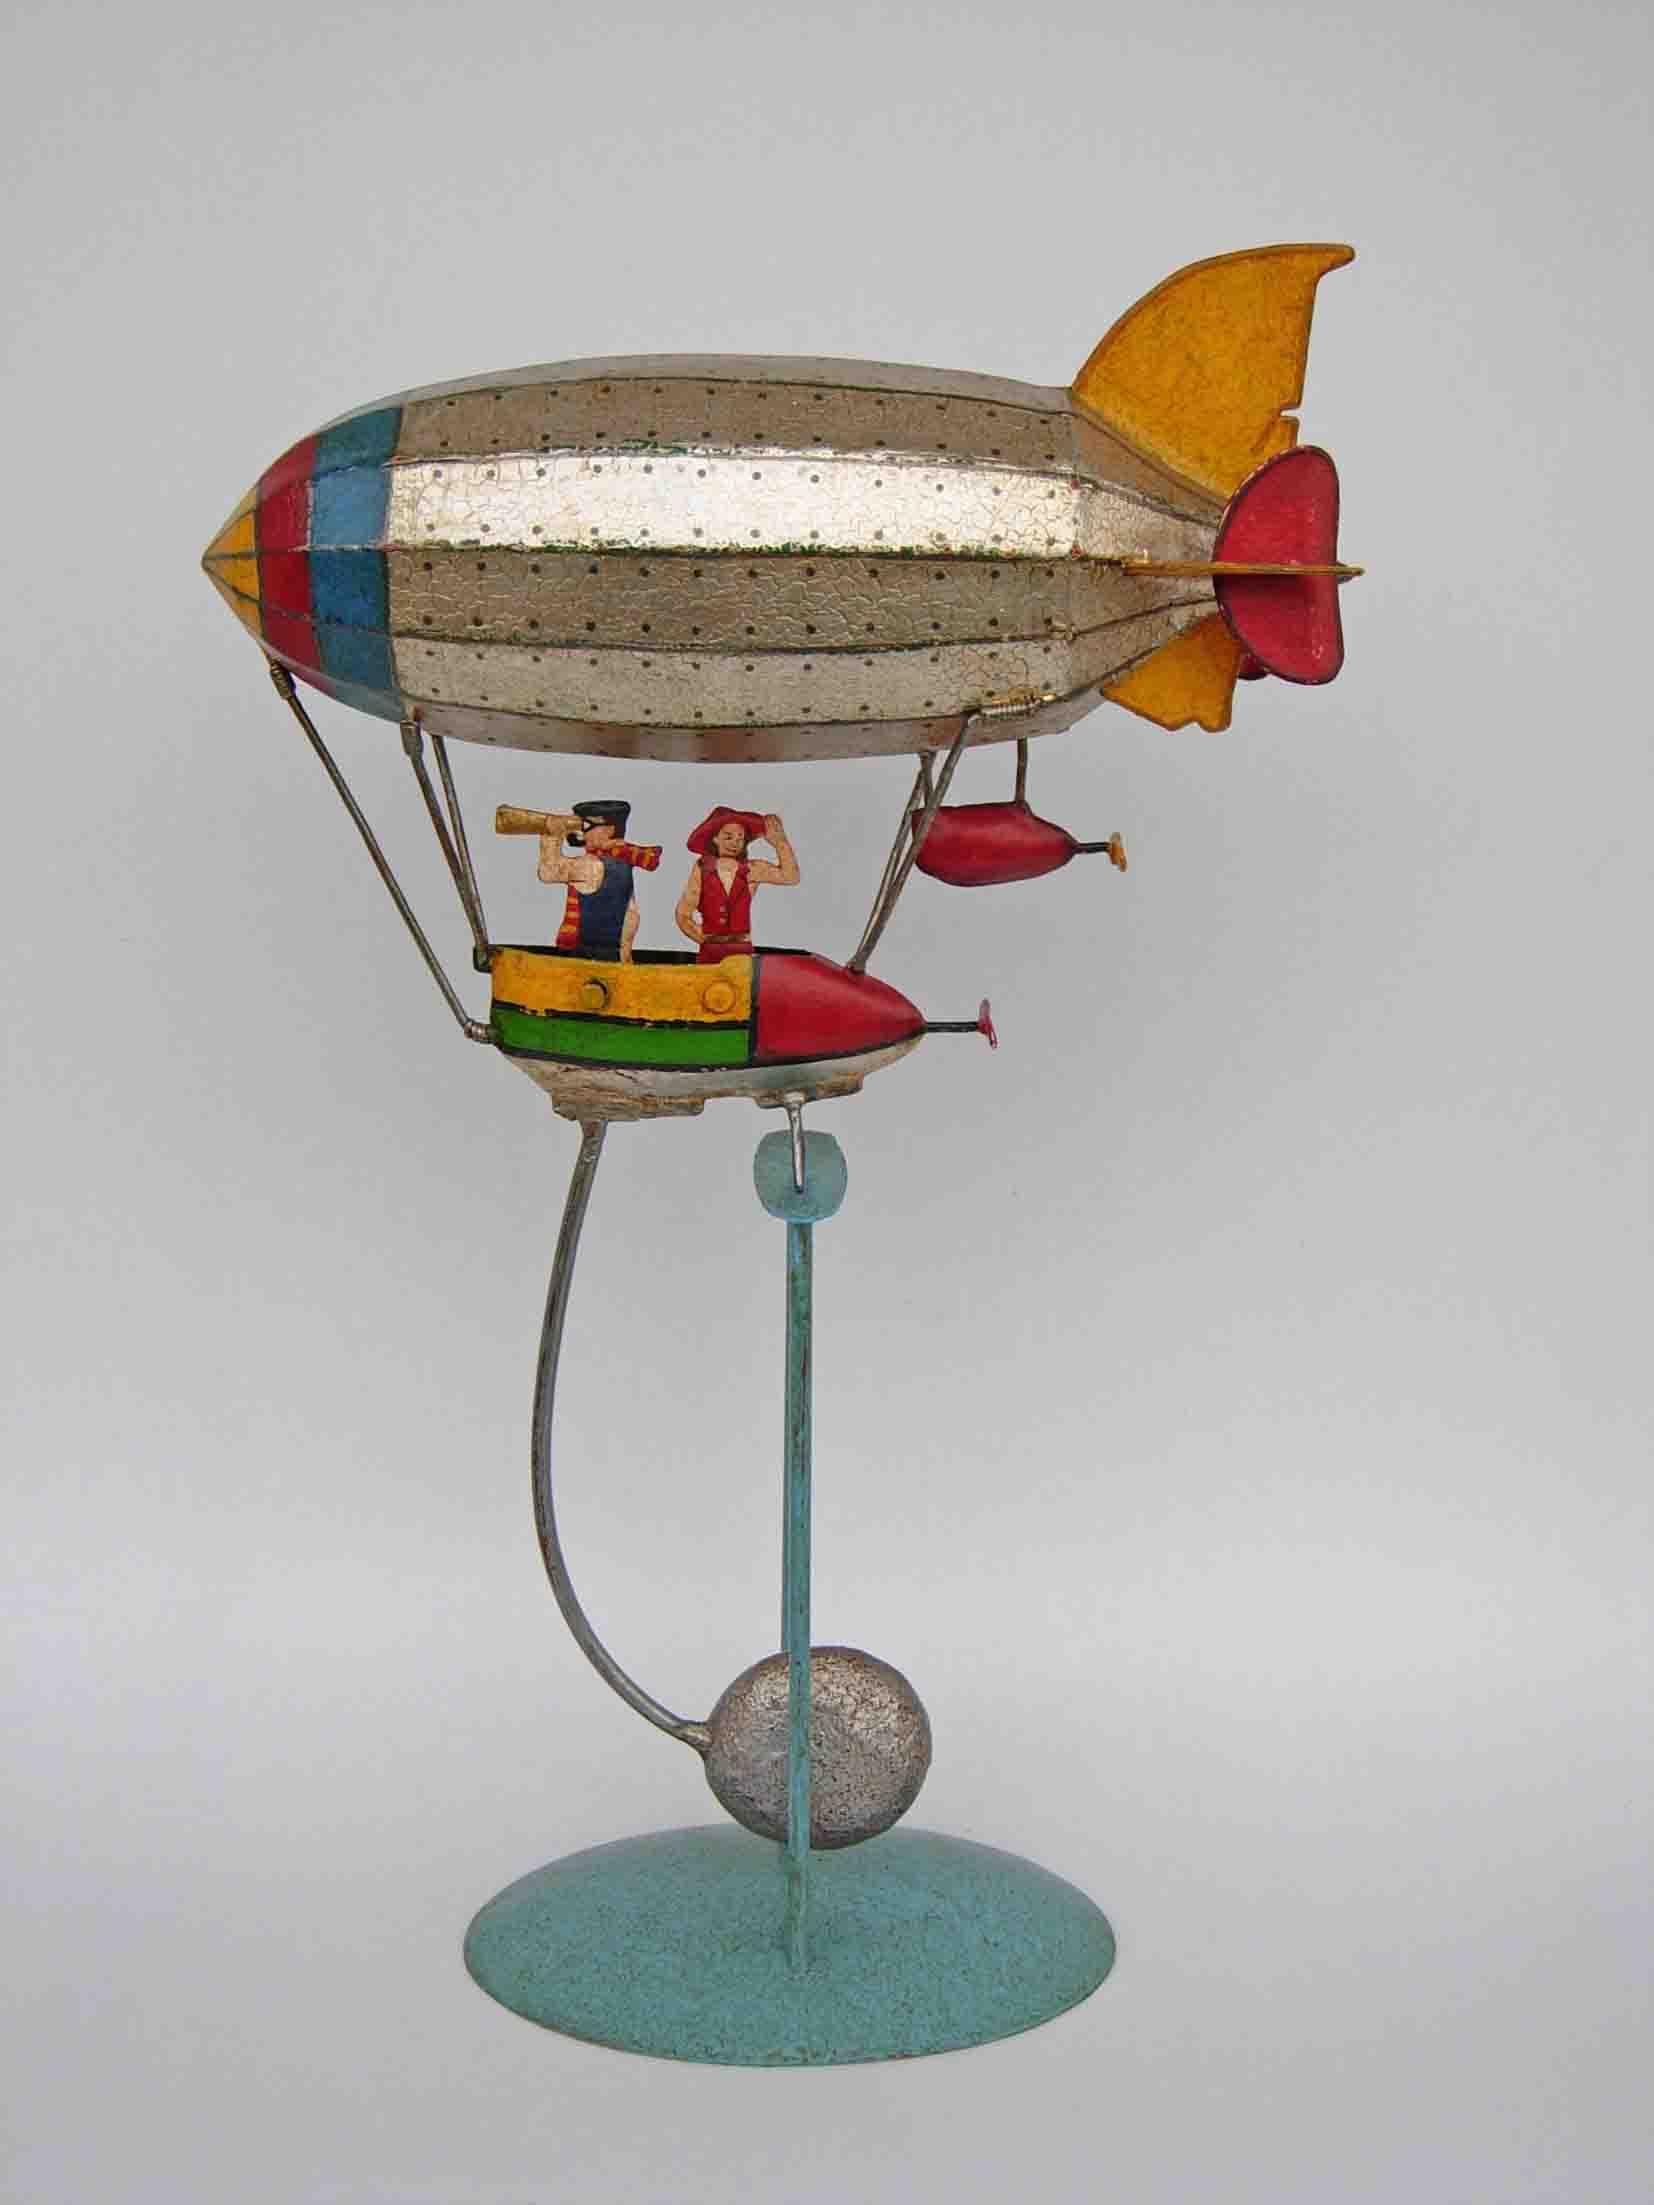 Balance Toys By Manuel Dacanay At Coroflot Com